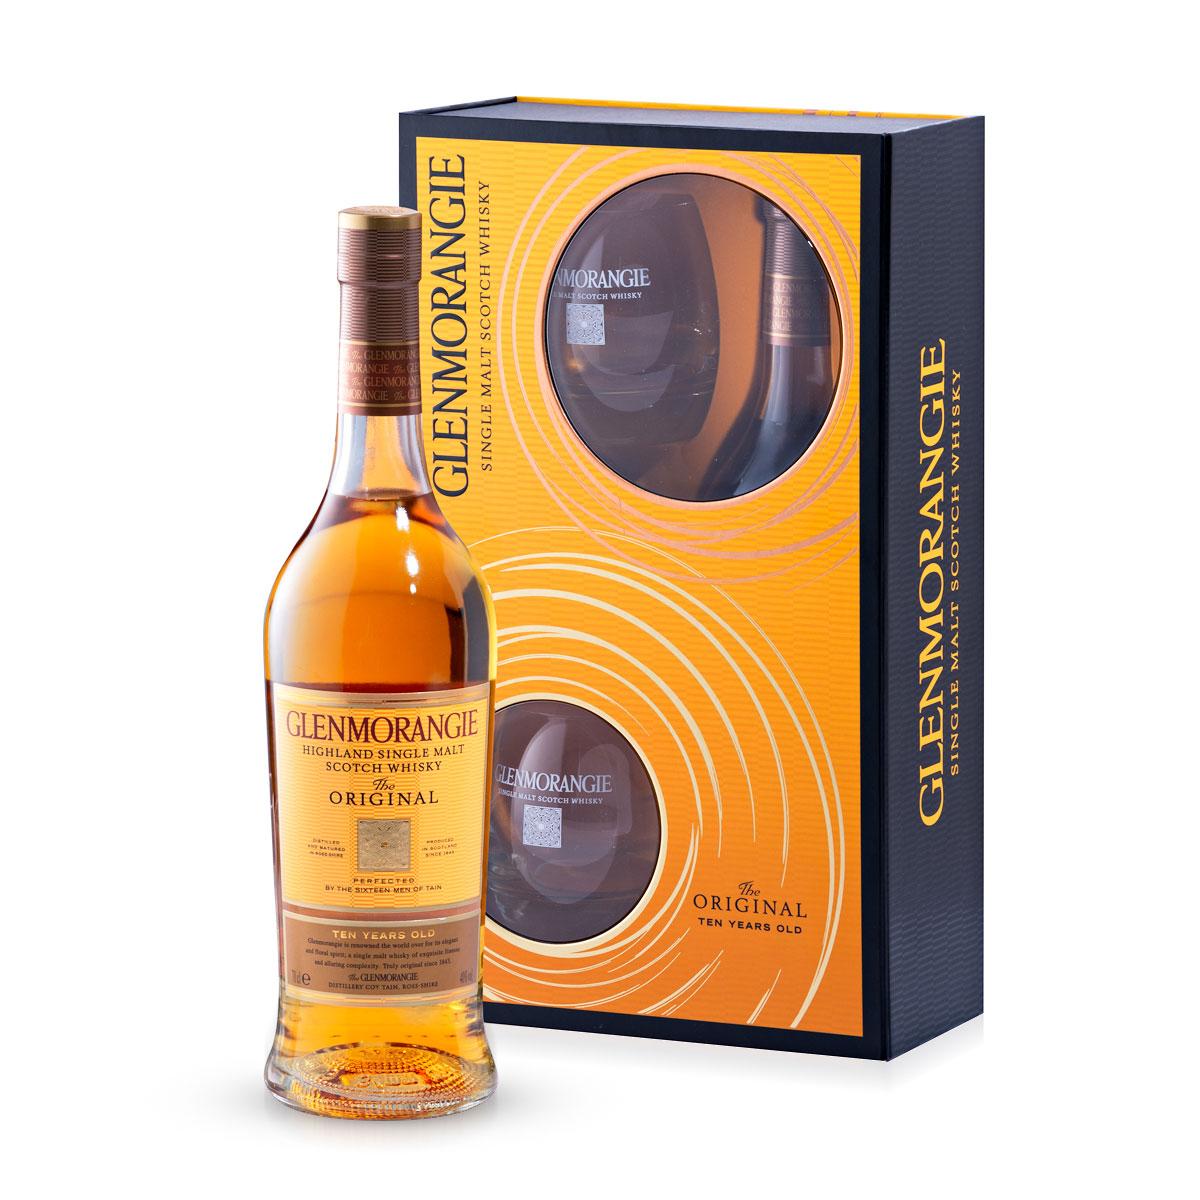 glenmorangie scotch whisky verres bo te cadeau 70 cl cadofrance. Black Bedroom Furniture Sets. Home Design Ideas